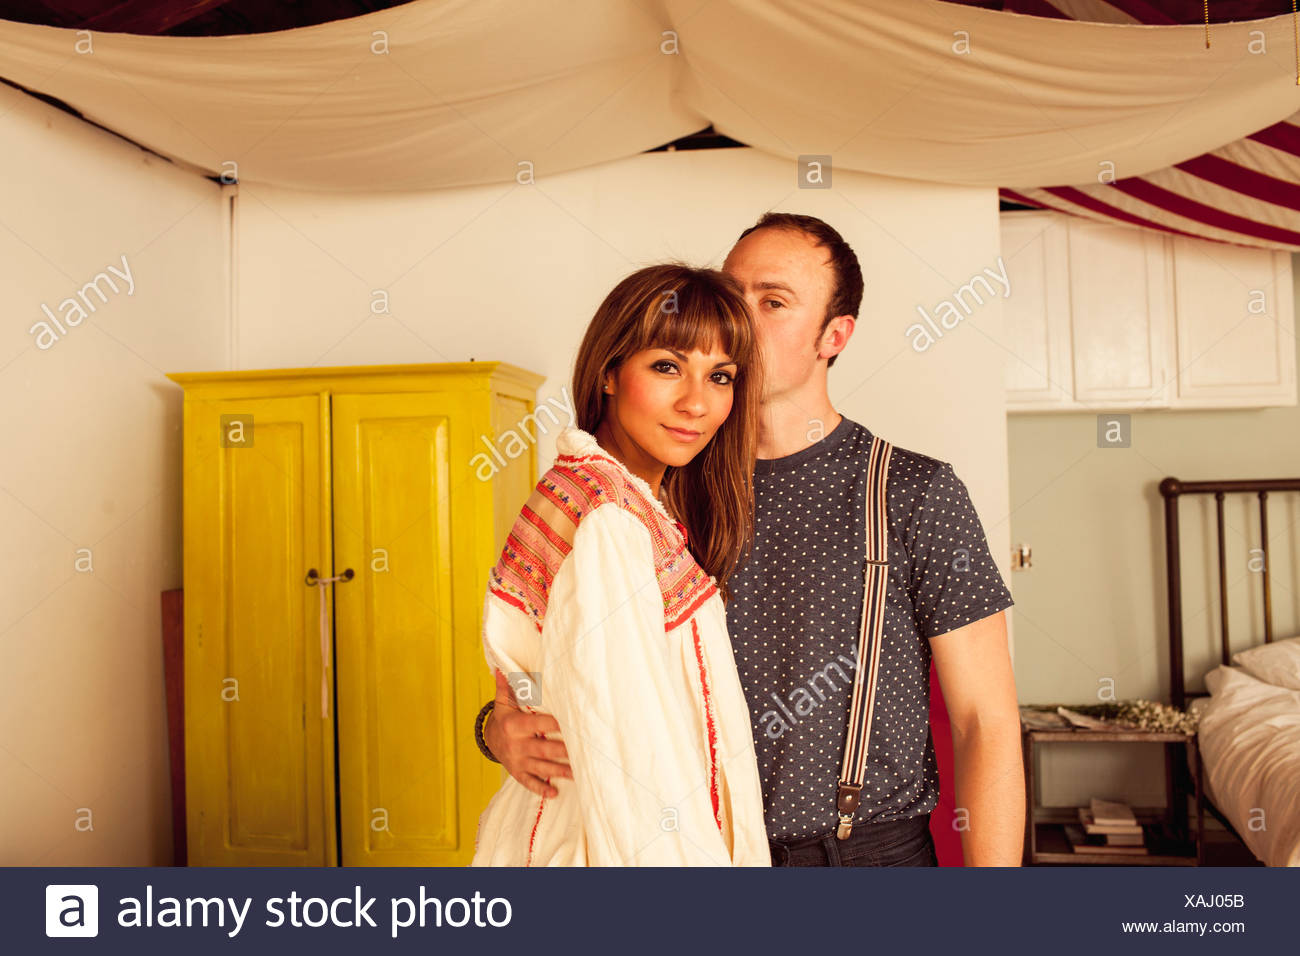 Mann mit Arm um Frau im Schlafzimmer Stockbild